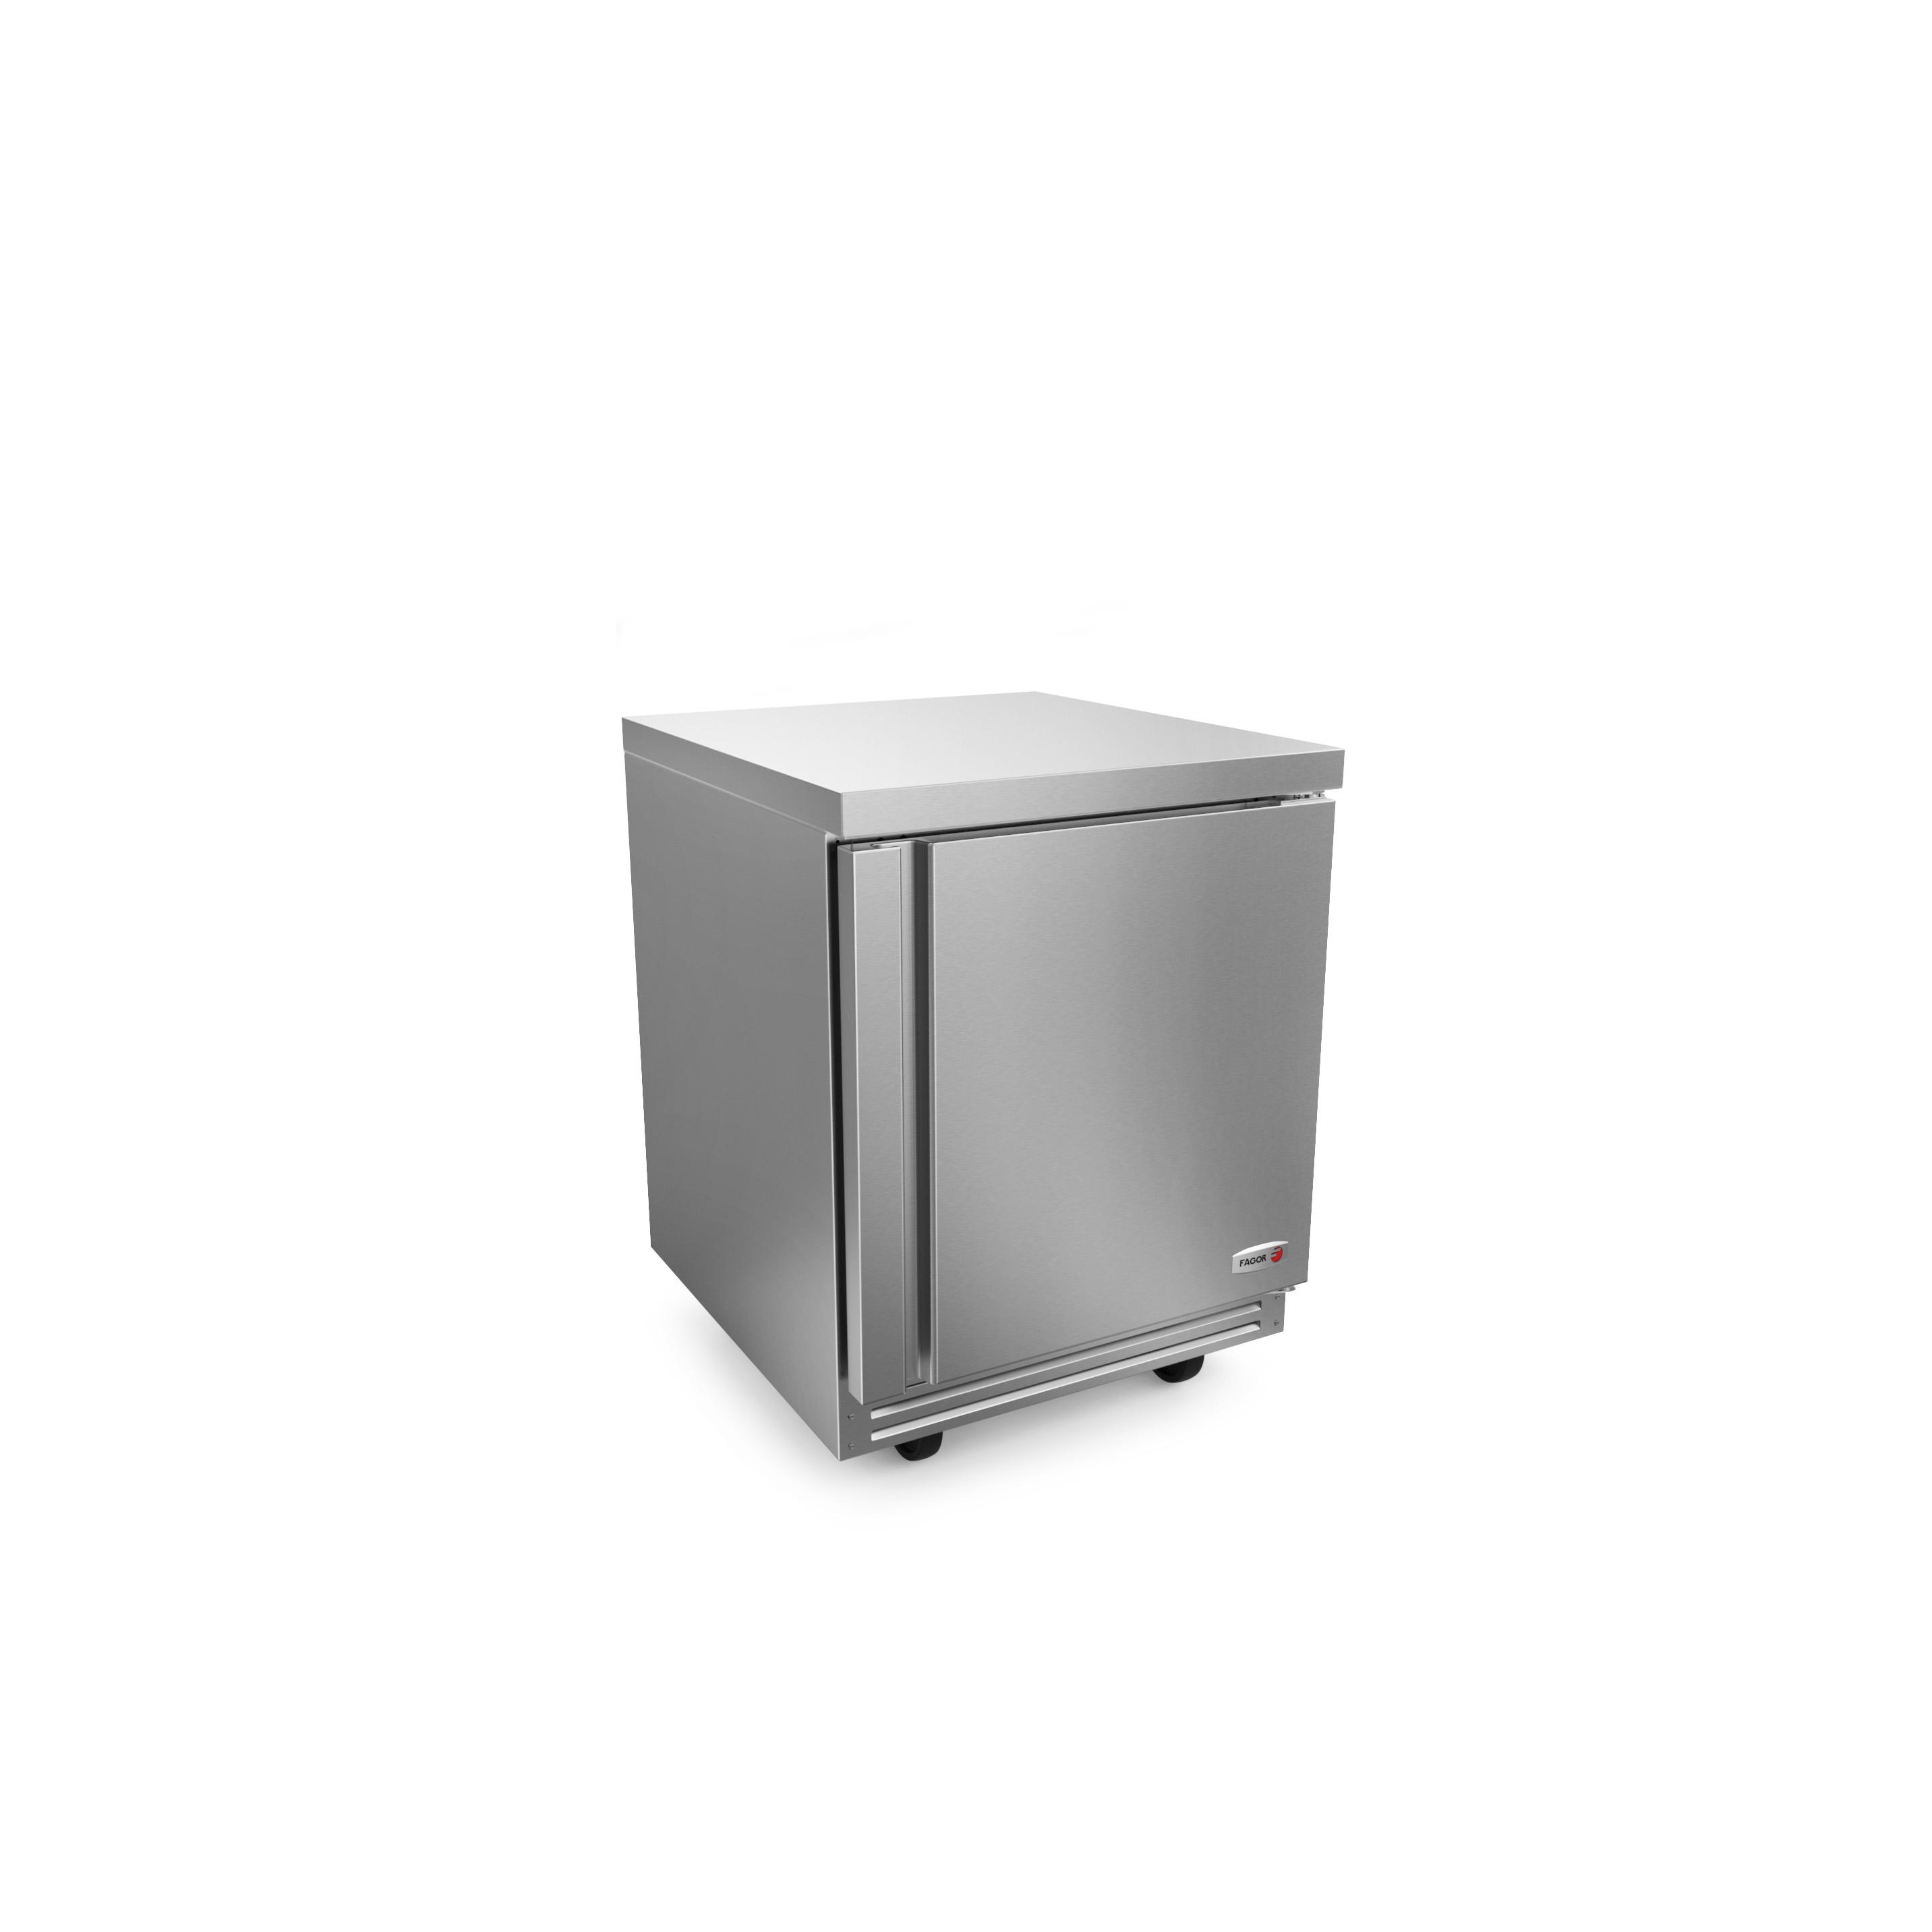 FUR-27-N Fagor Refrigeration refrigerator, undercounter, reach-in